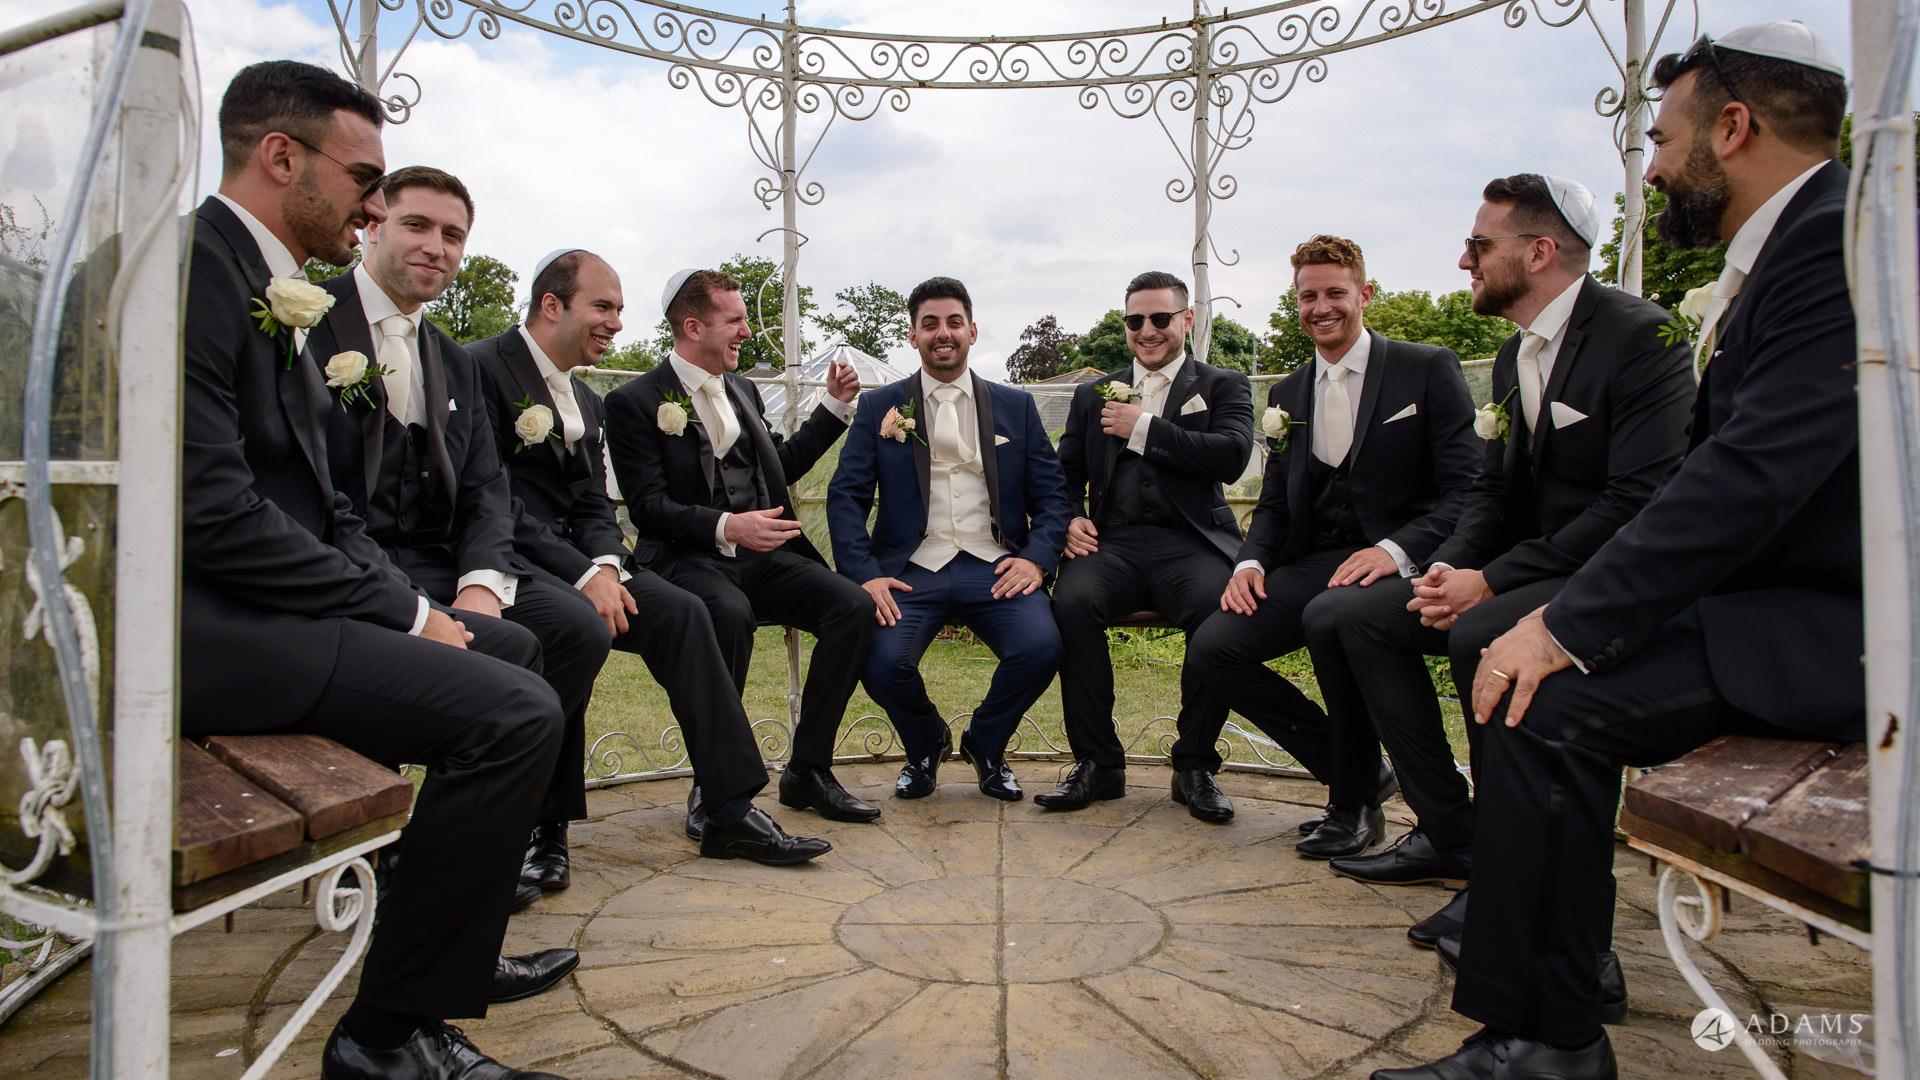 Jewish Wedding at Manor of Groves Wedding Photography   Candice + Doron 60